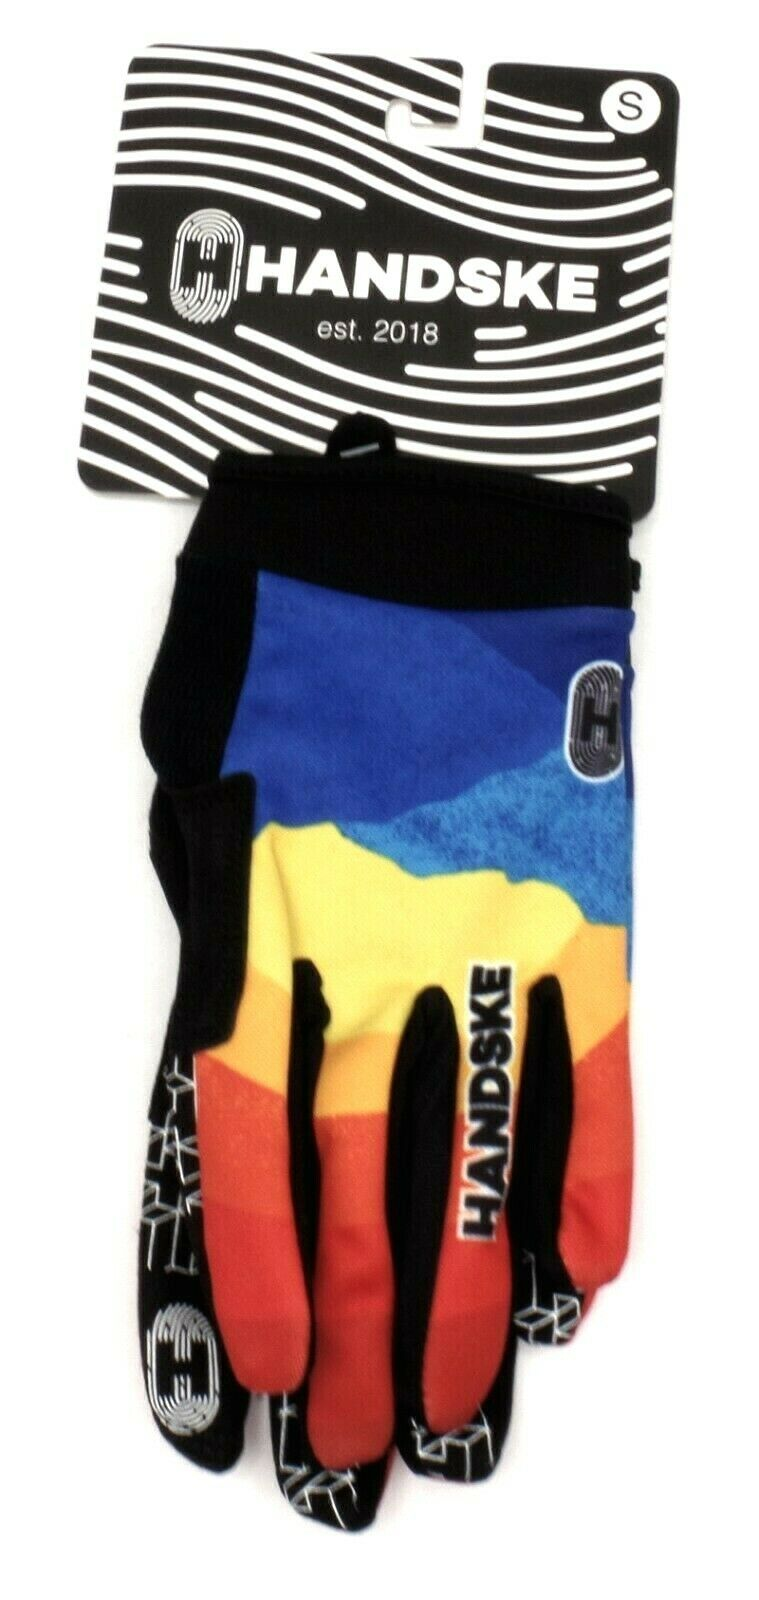 Handske Ridgeline Full Finger Cycling Gloves, Adult Small, Blue/Yellow/Orange/Re